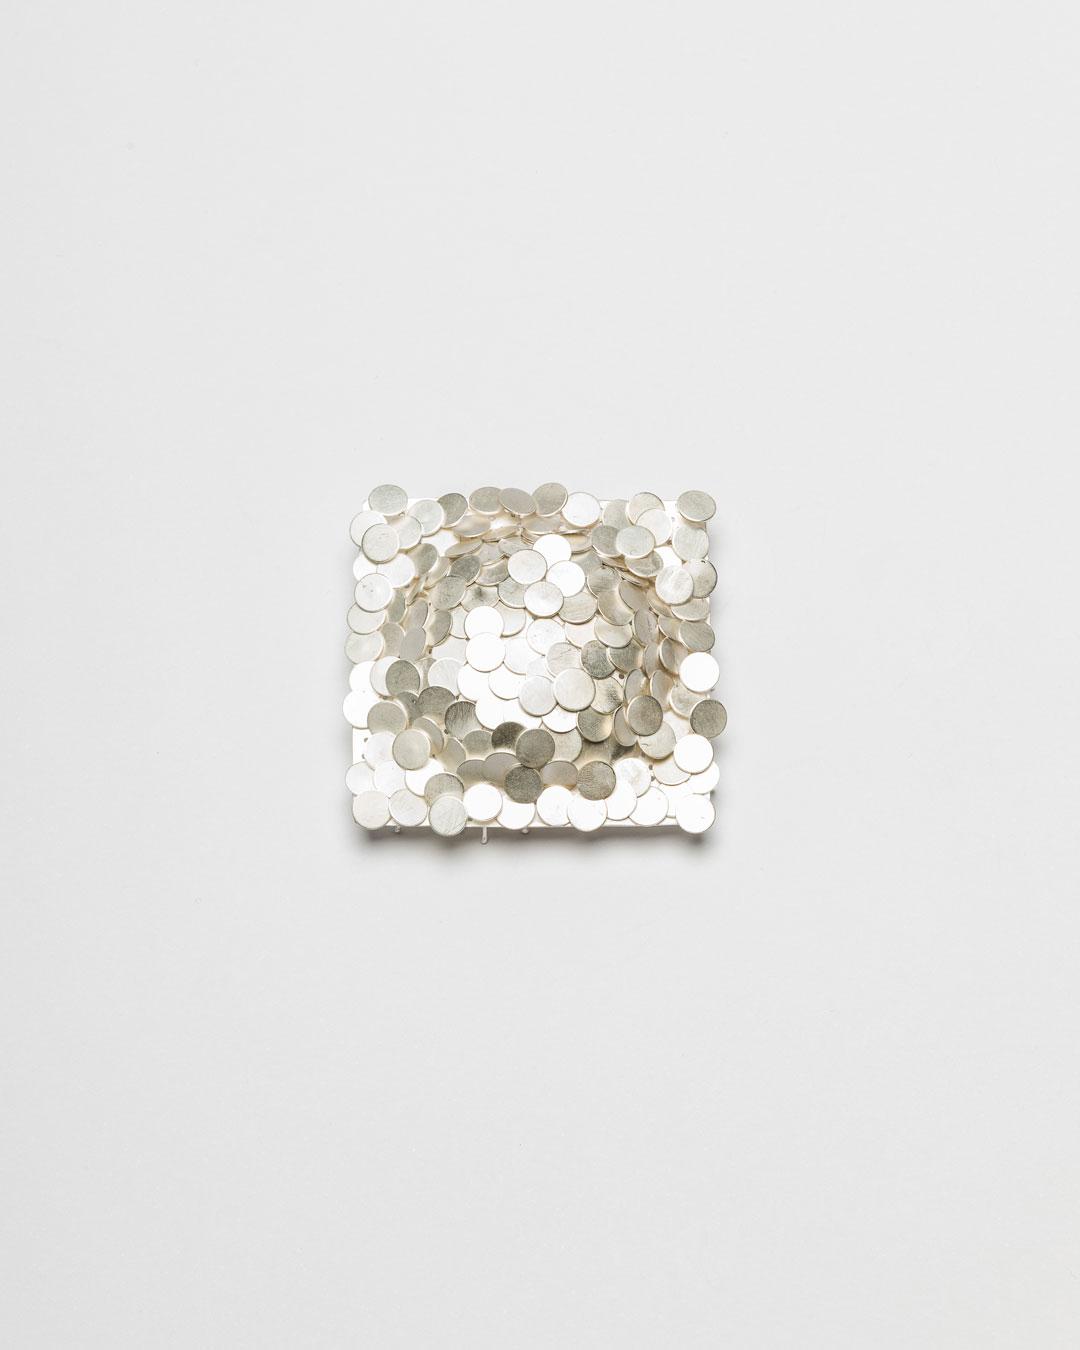 Christine Matthias, untitled, 2018, brooch; silver, 62 x 62 x 22 mm, €1825